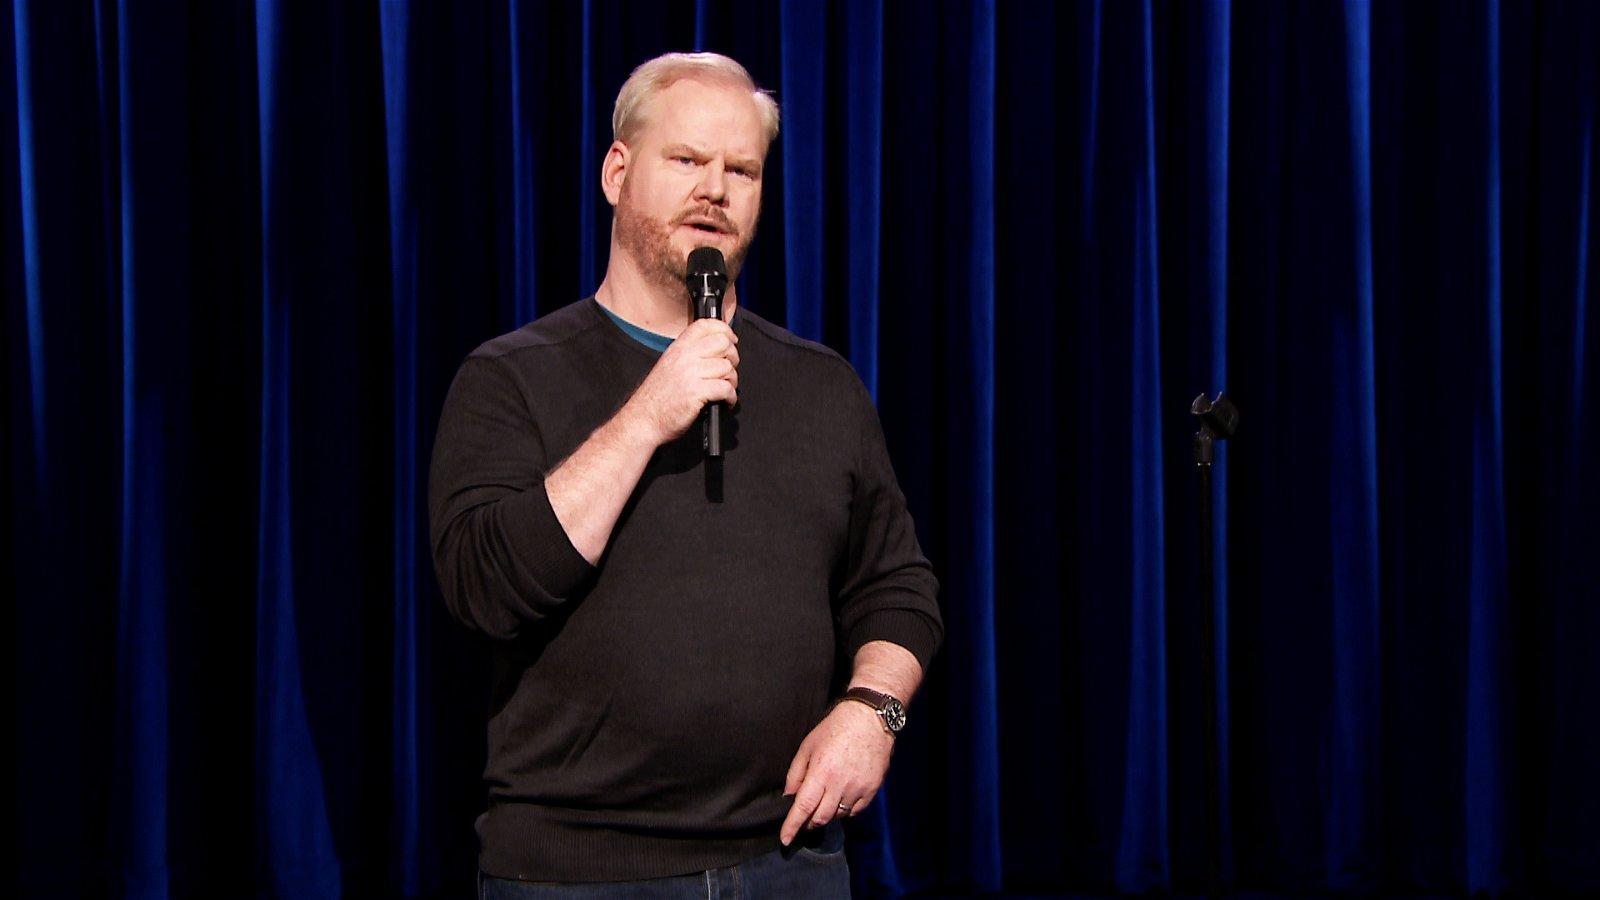 Fargo Season 3 casts stand-up comedian Jim Gaffigan 2